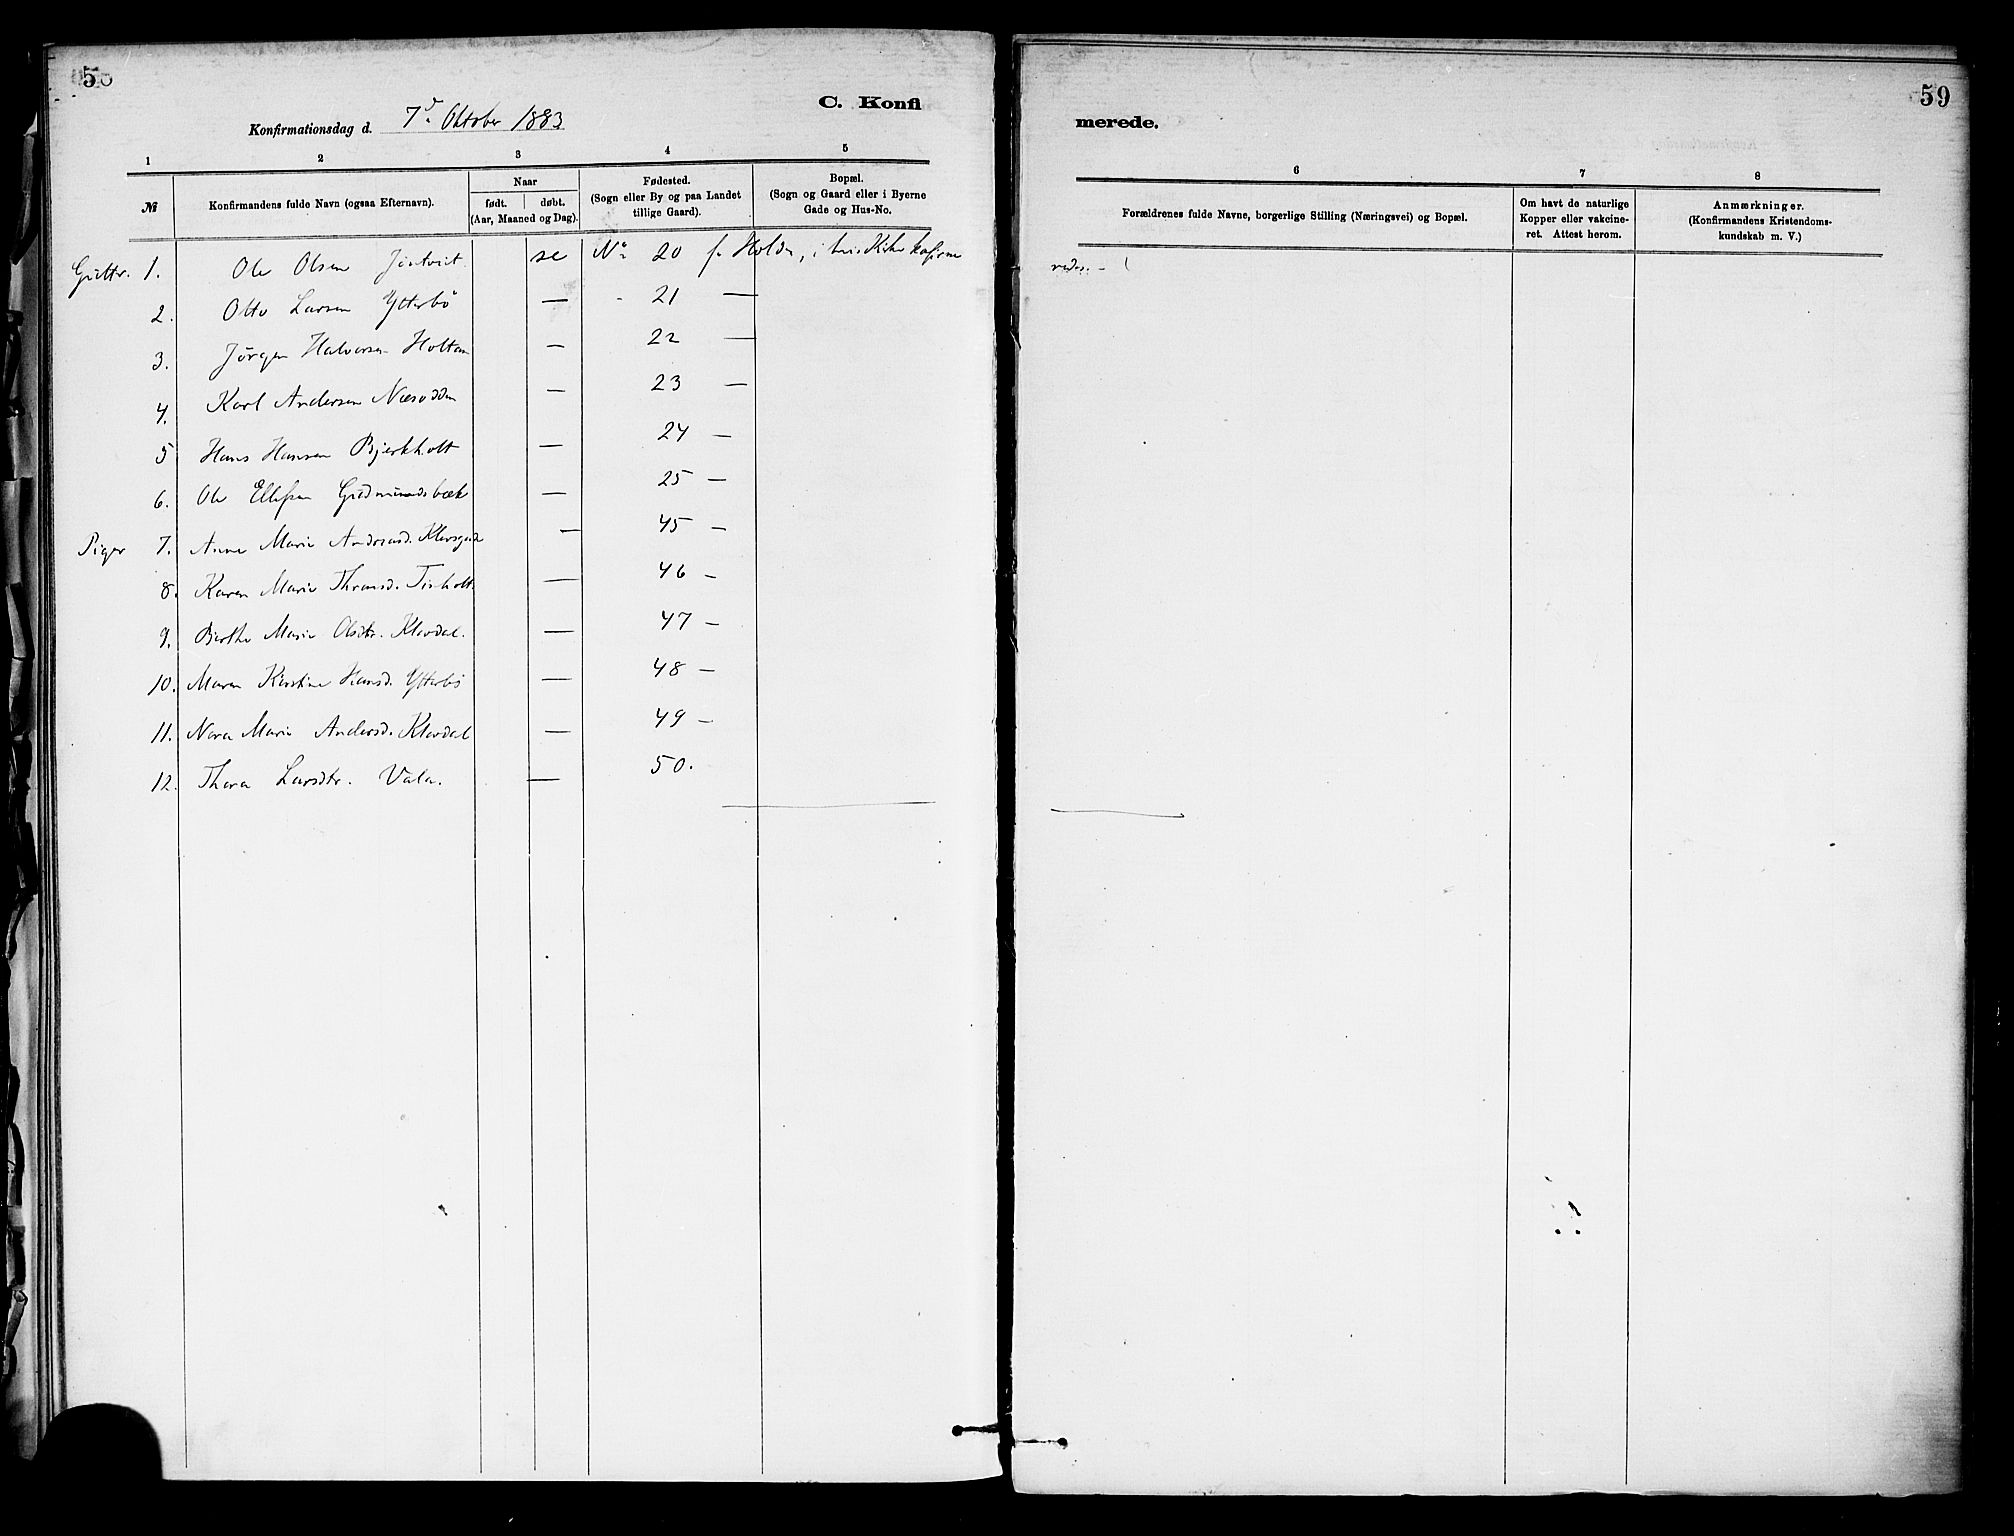 SAKO, Holla kirkebøker, F/Fa/L0009: Ministerialbok nr. 9, 1881-1897, s. 58